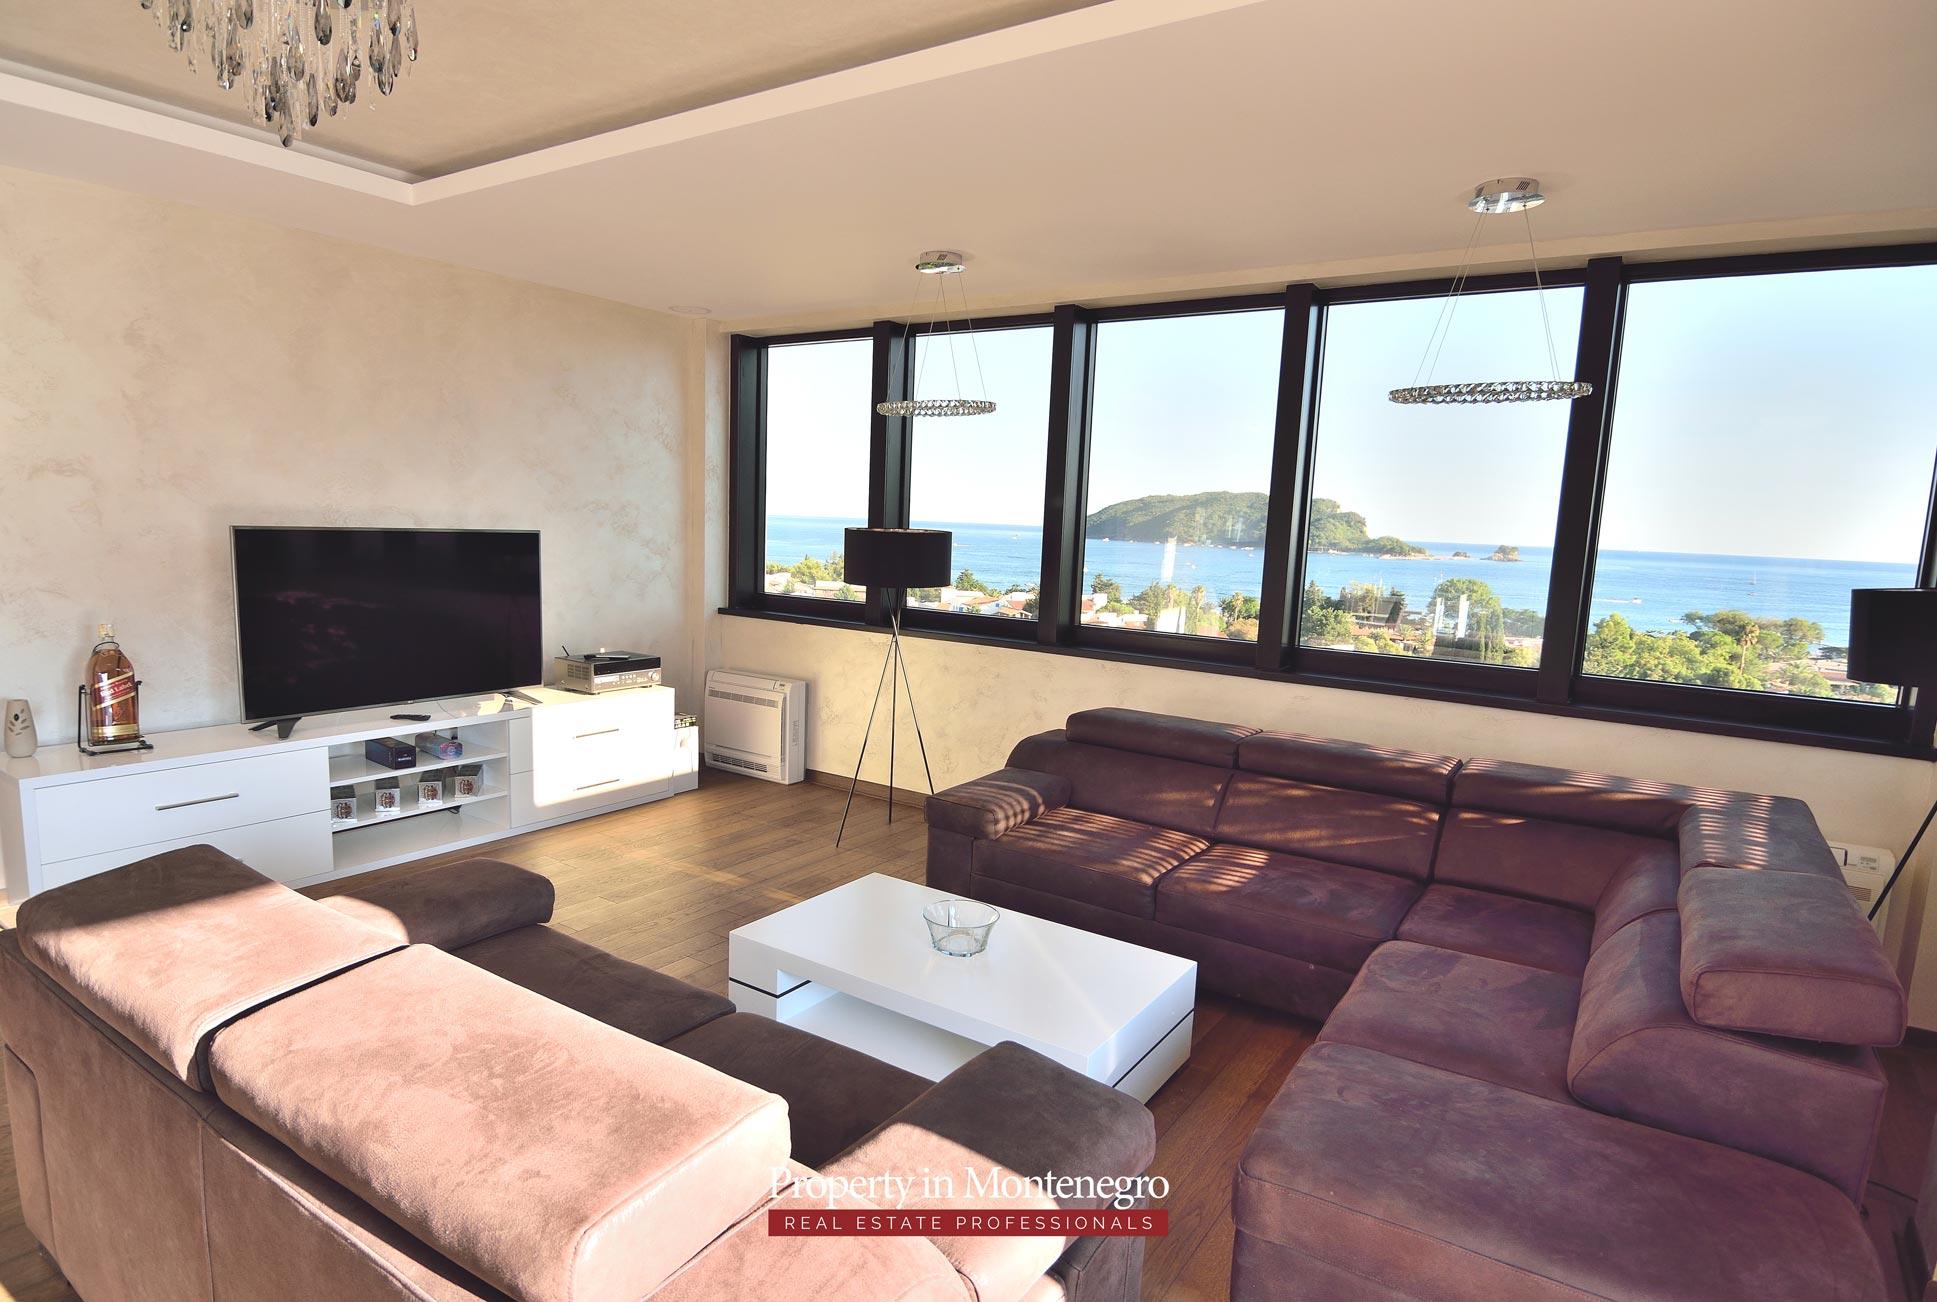 Luxury penthouse for sale in Budva